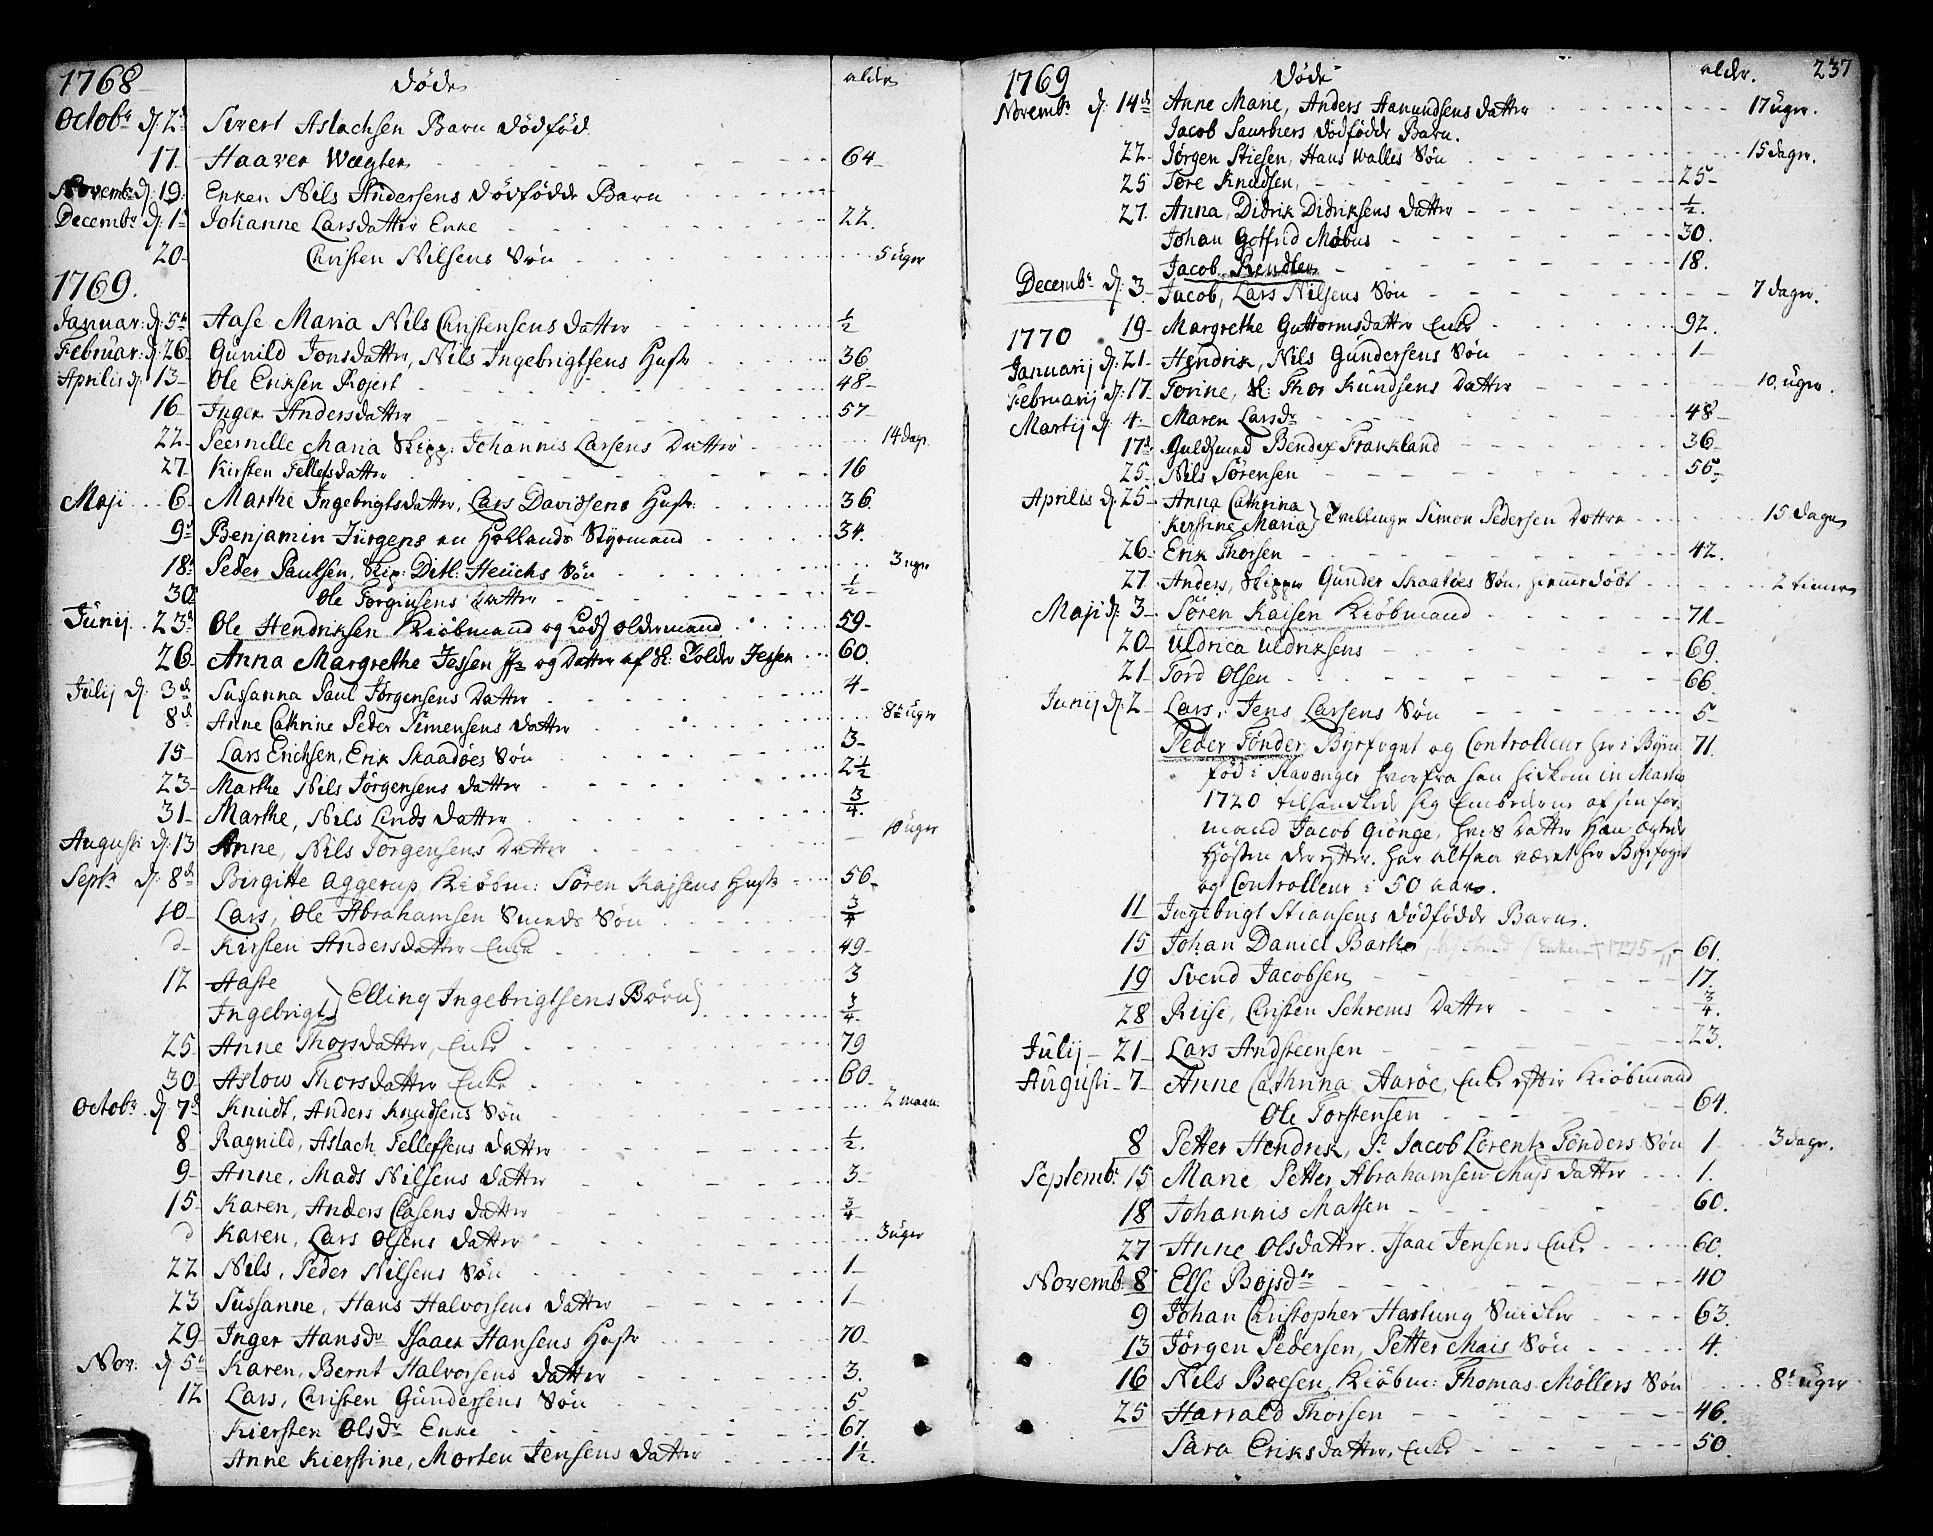 SAKO, Kragerø kirkebøker, F/Fa/L0002: Ministerialbok nr. 2, 1767-1802, s. 237